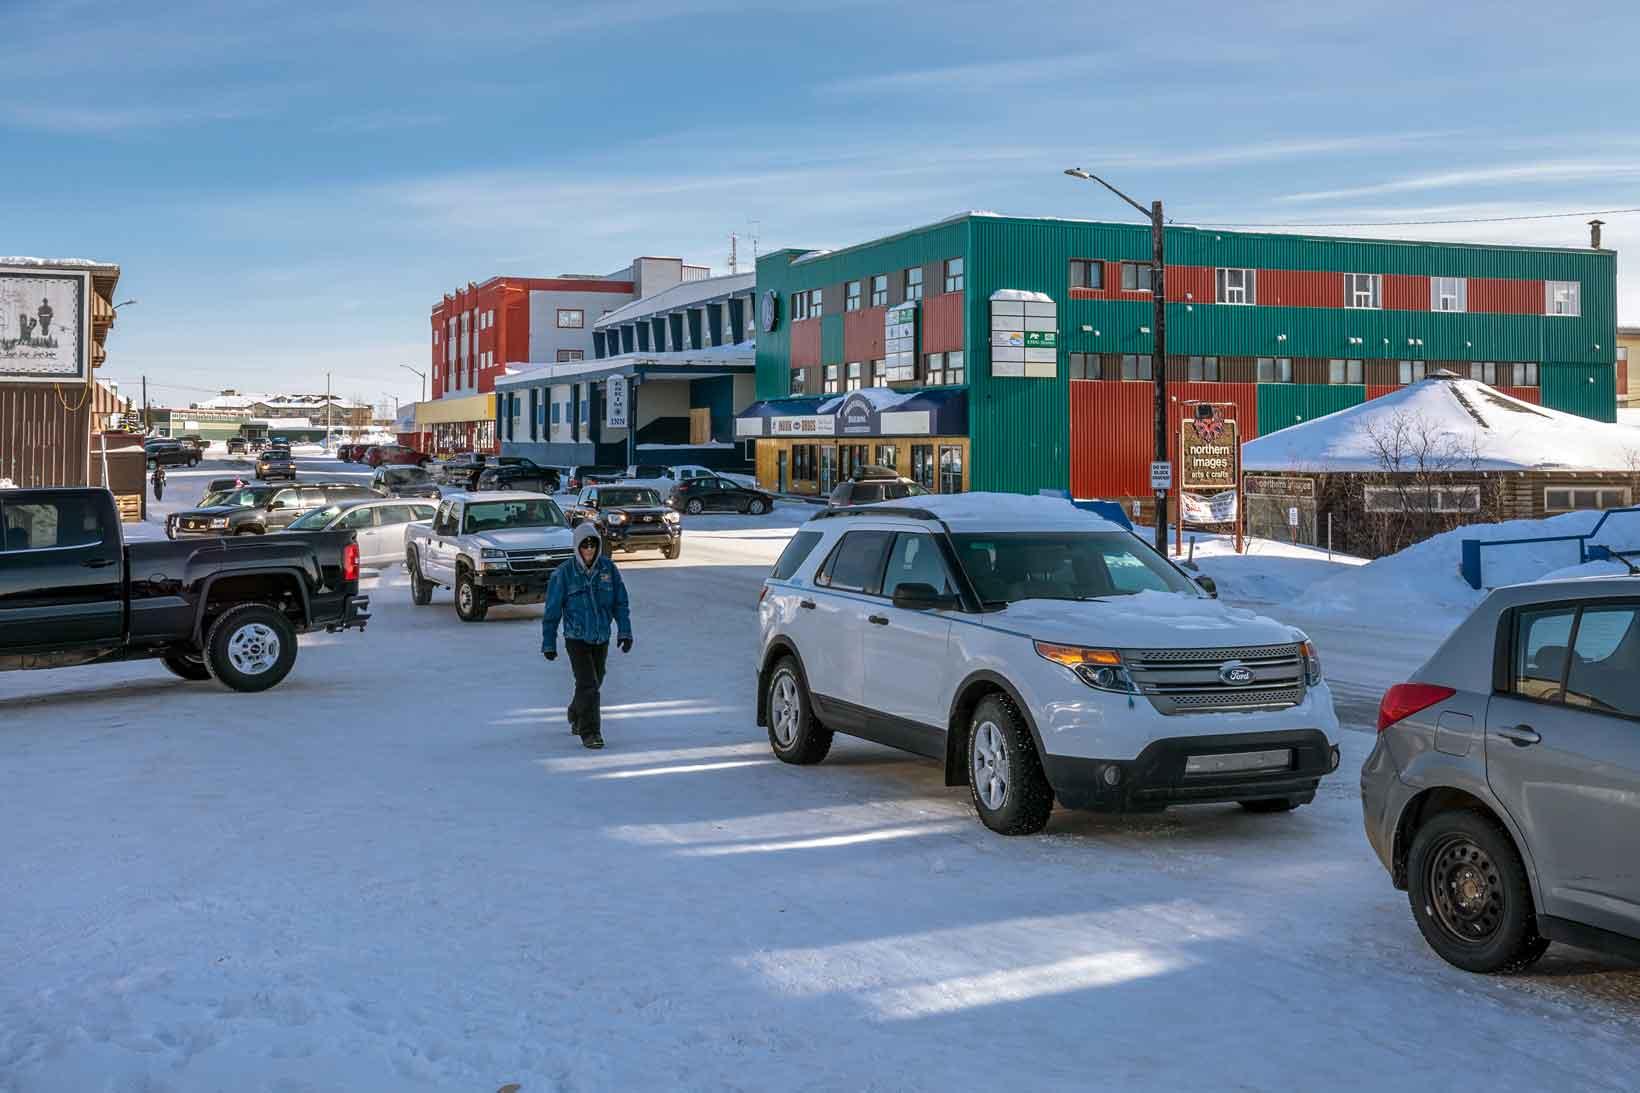 Inuvik, Northwest Territories, Canada